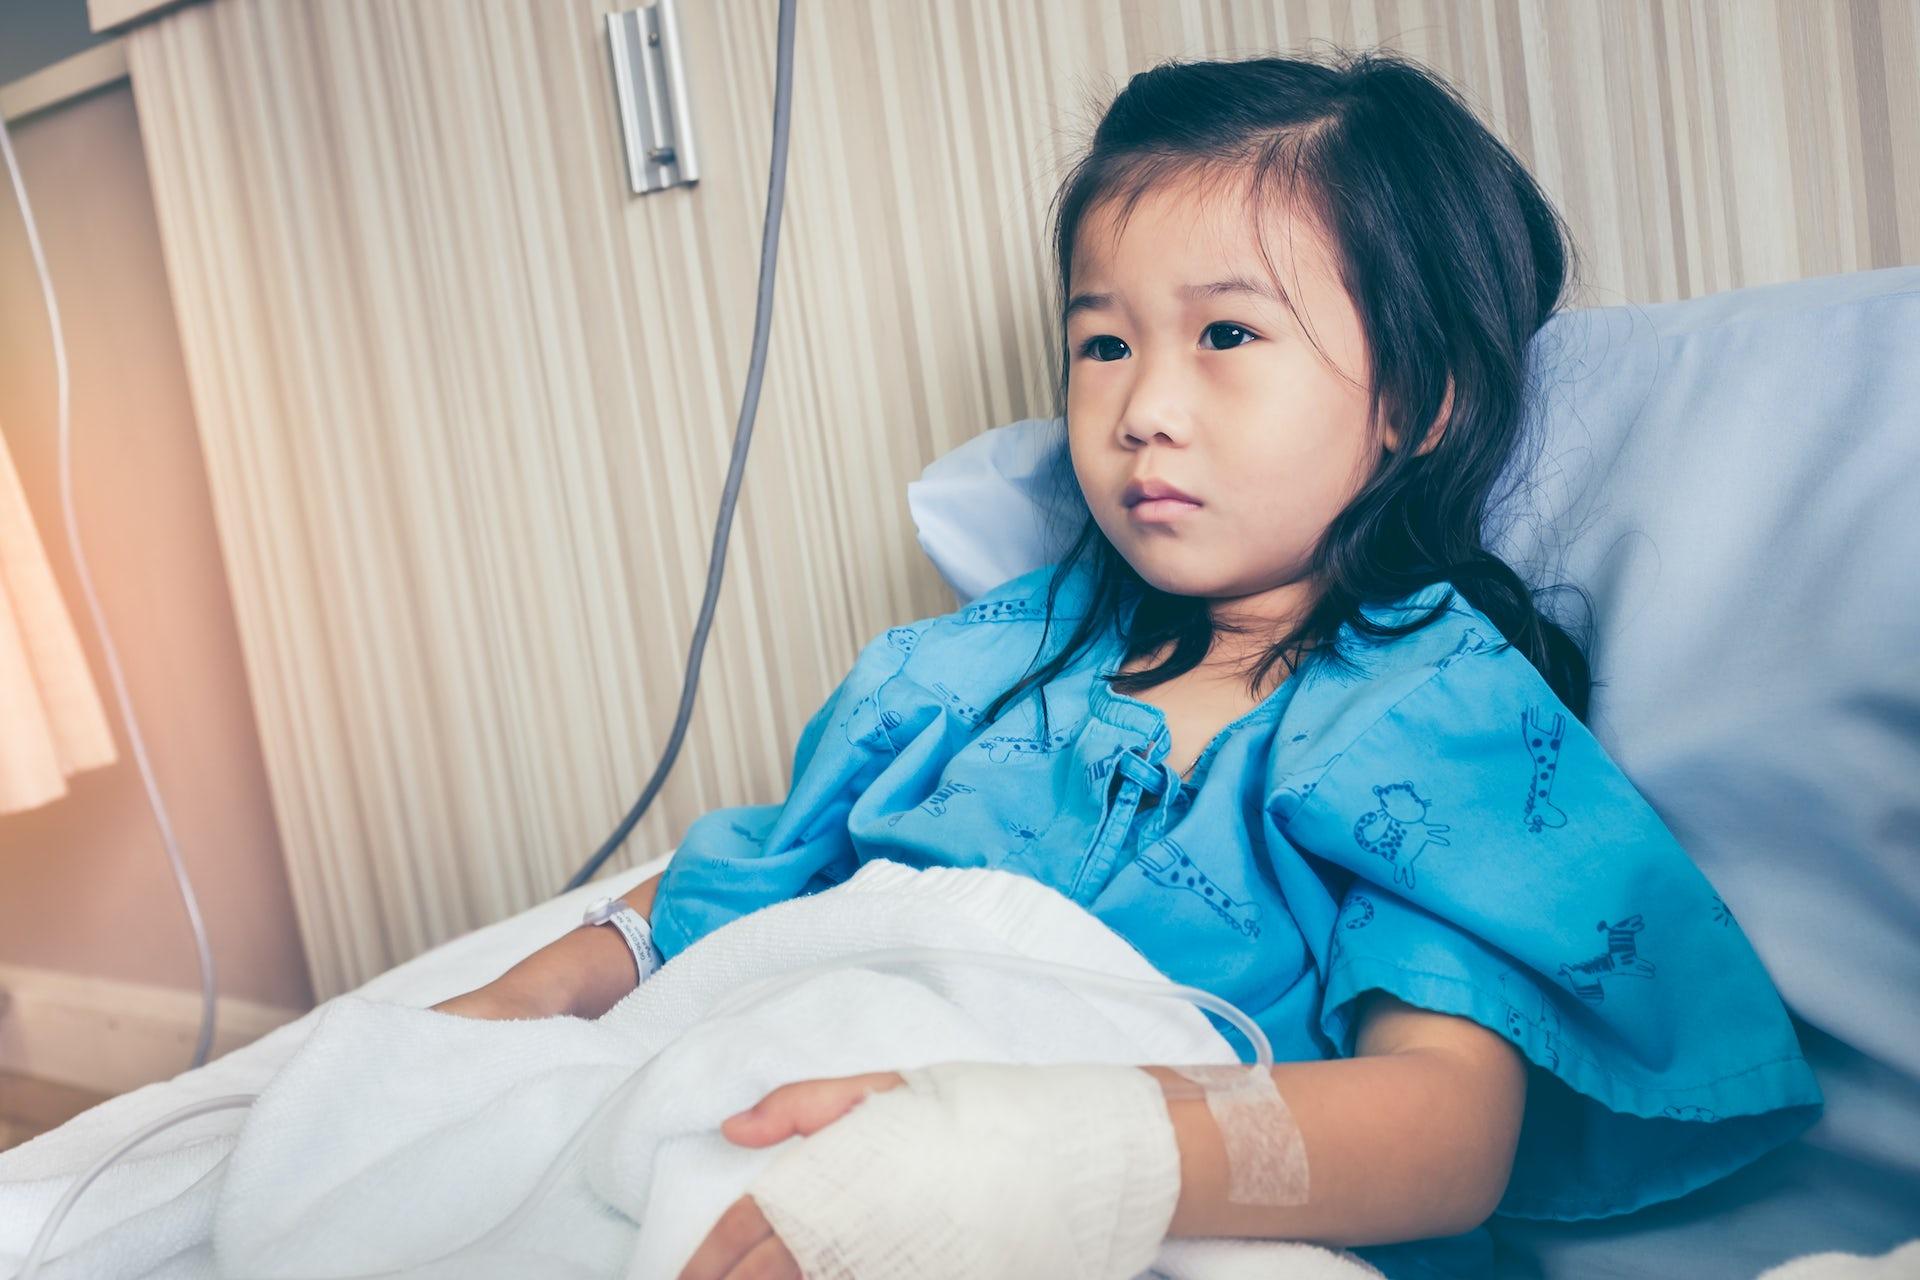 Doctors use TV in treating children